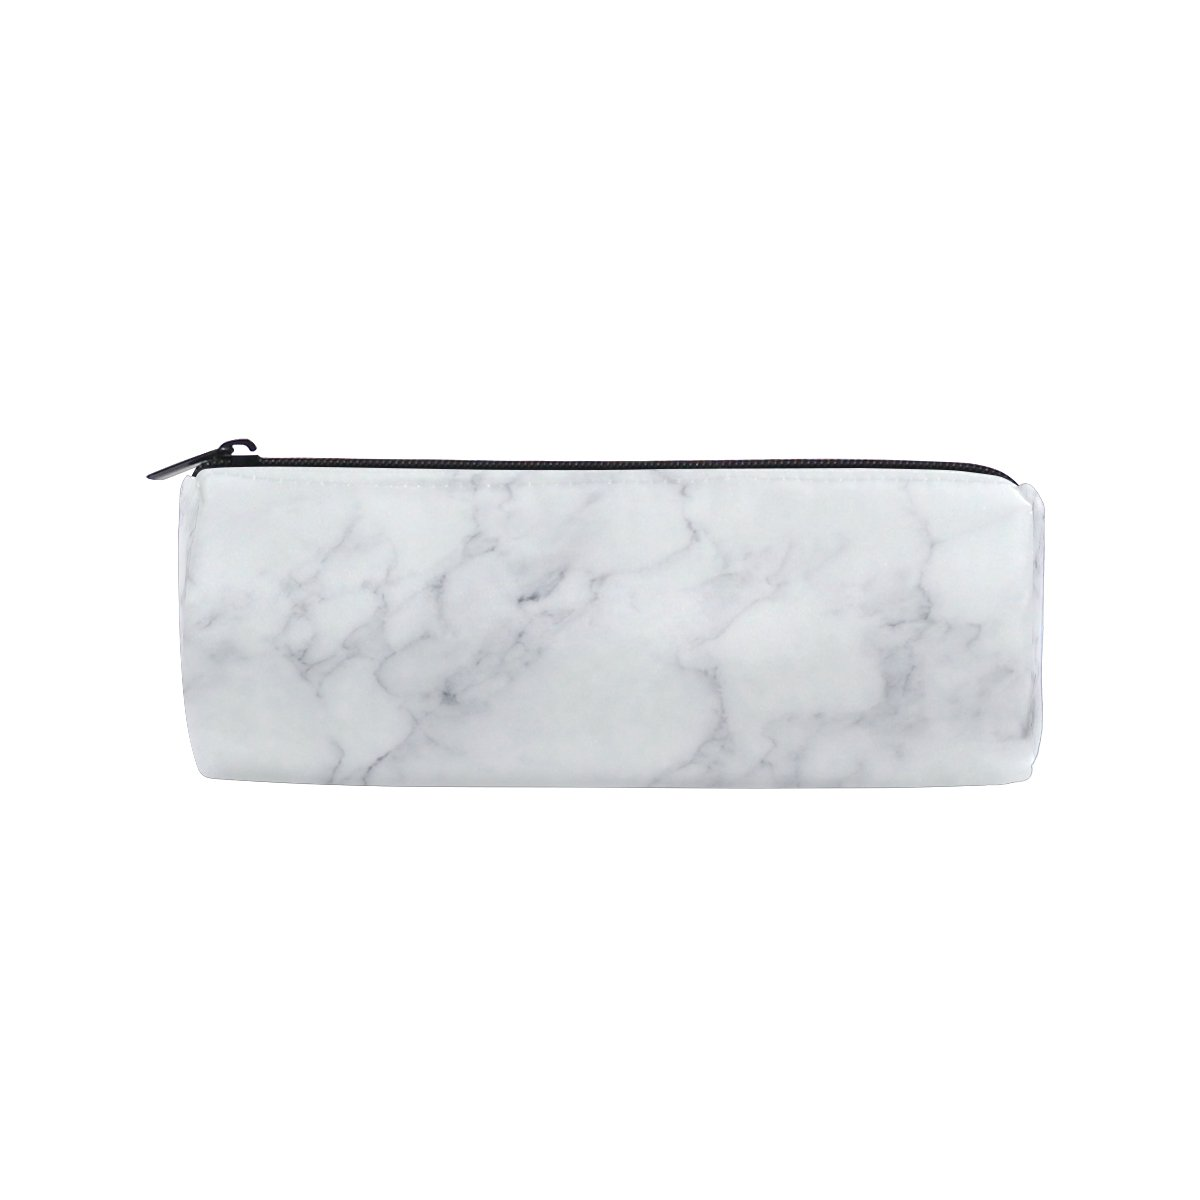 Cooper Girl White Marble Pencil Bag Pen Case Students Stationery Pouch Zipper Bag for Girls Boys Kids